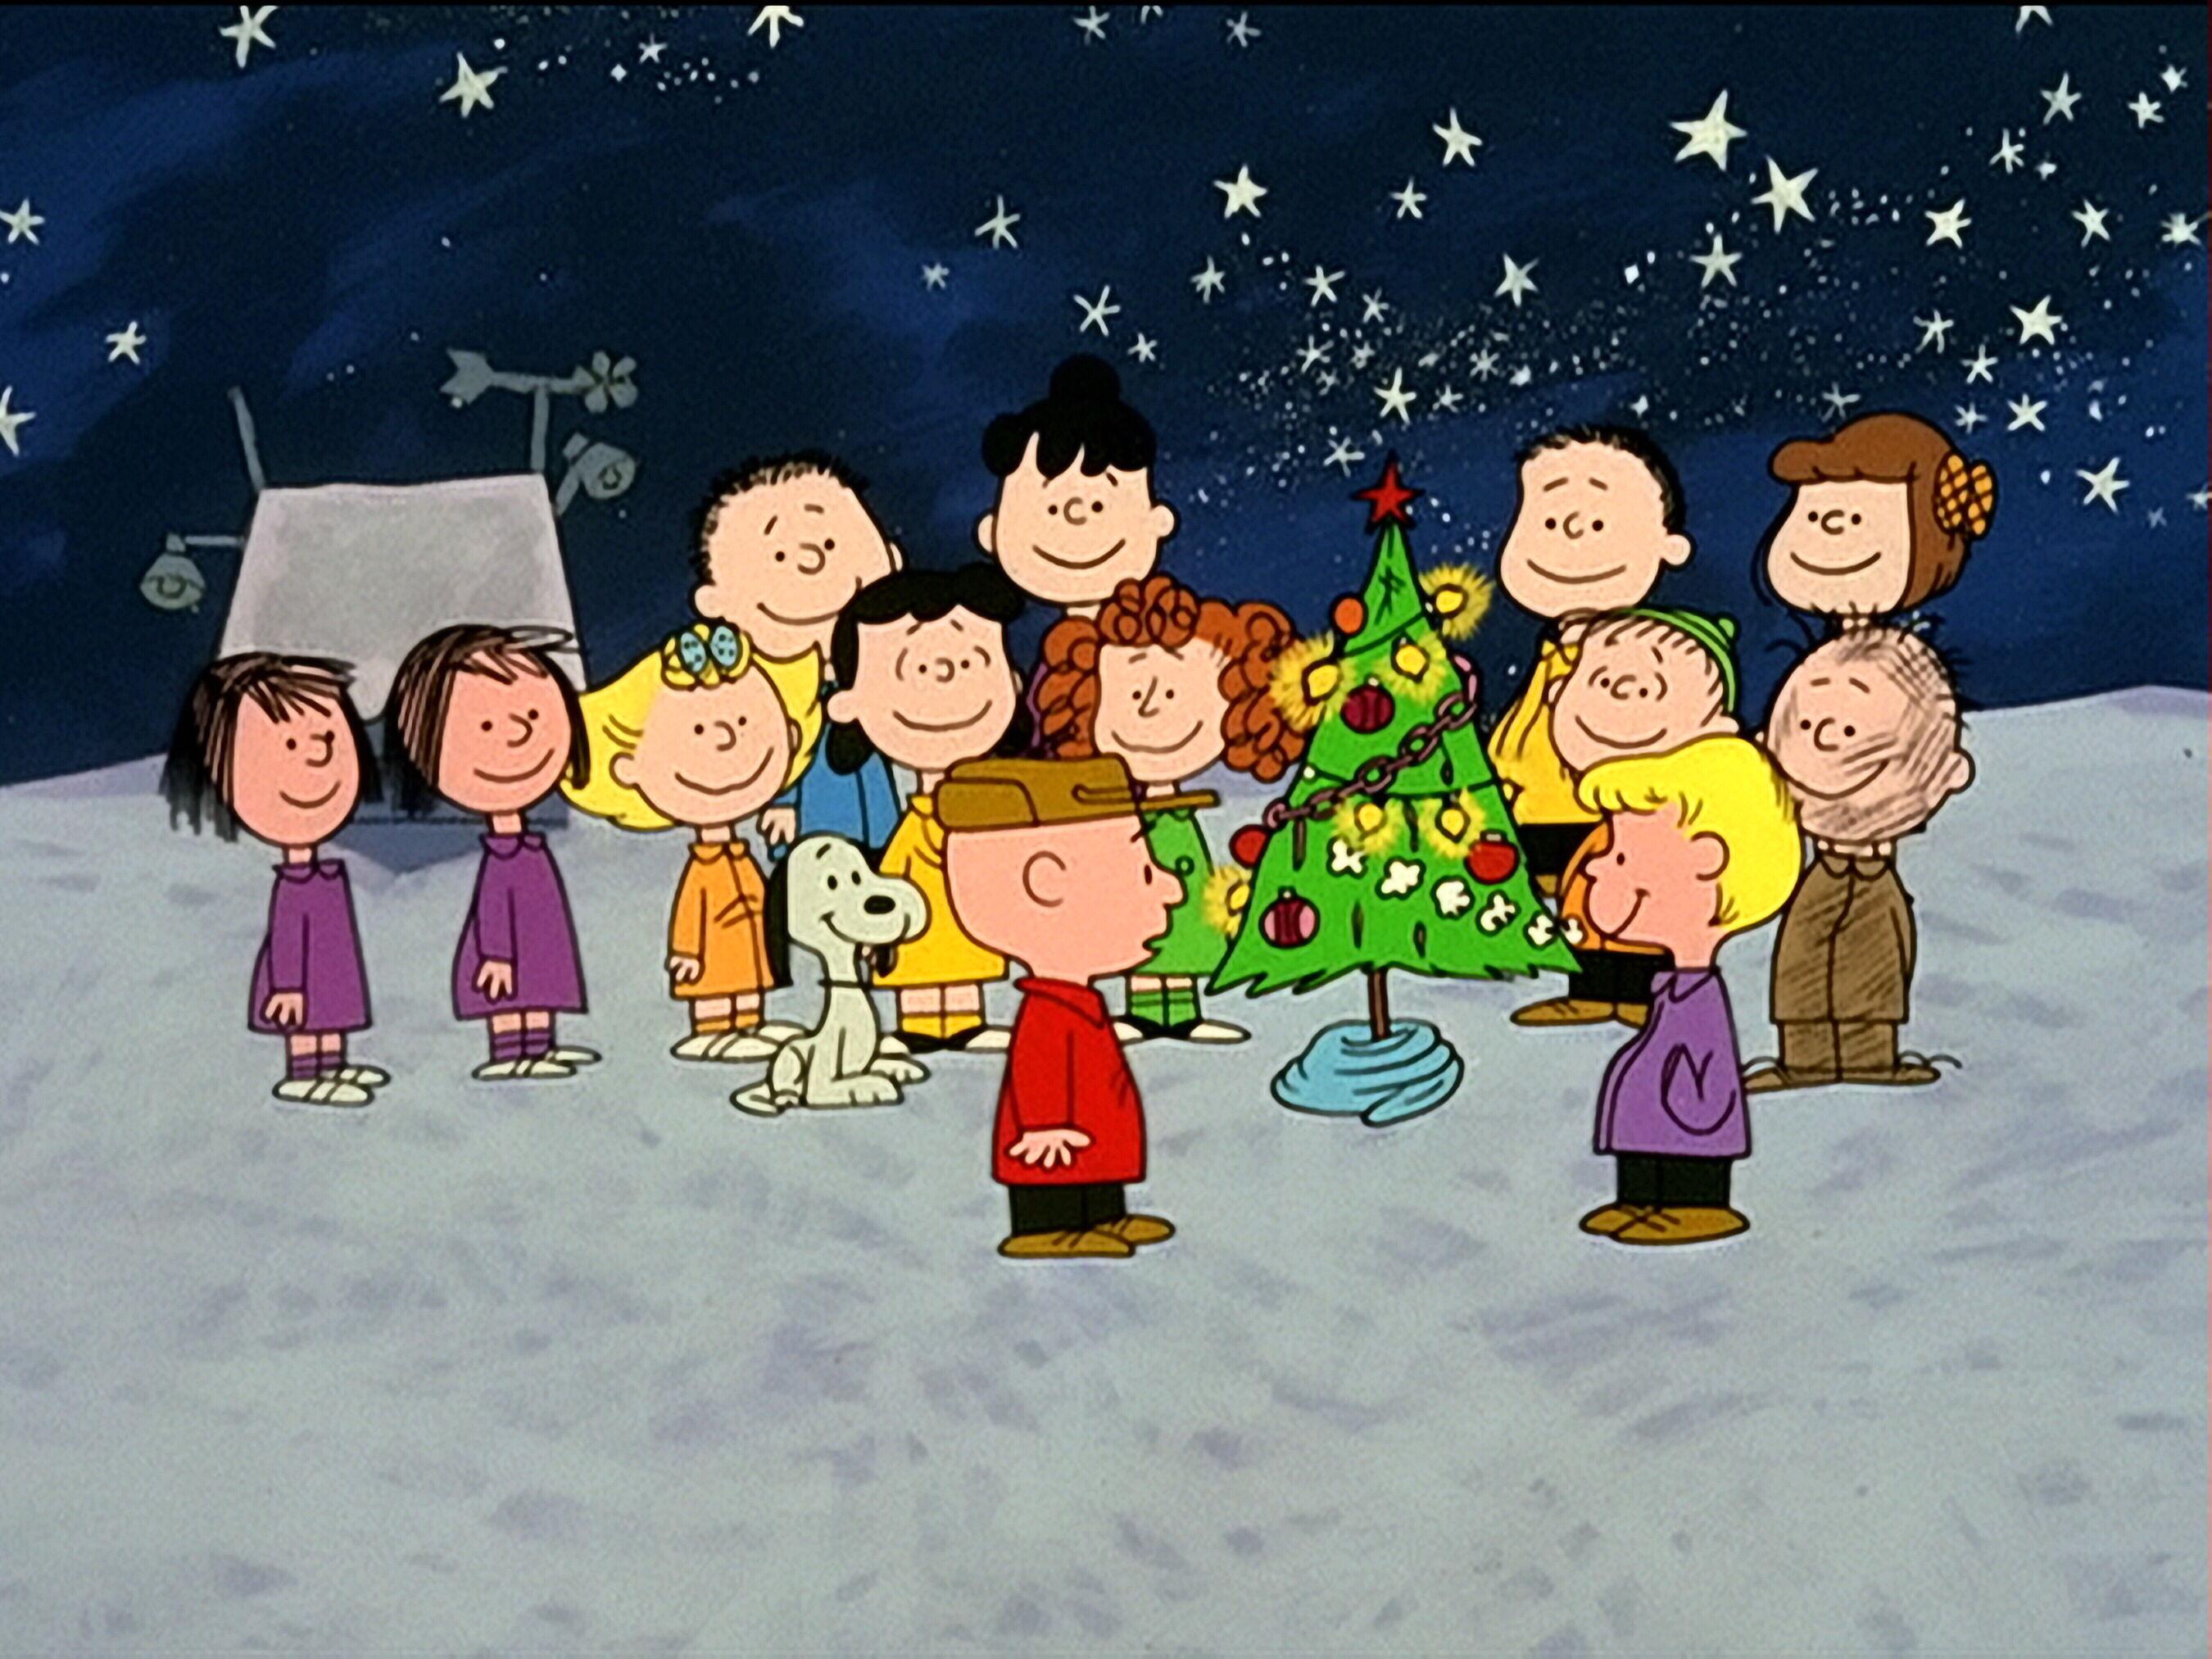 910318cb461de The bleak world of Peanuts